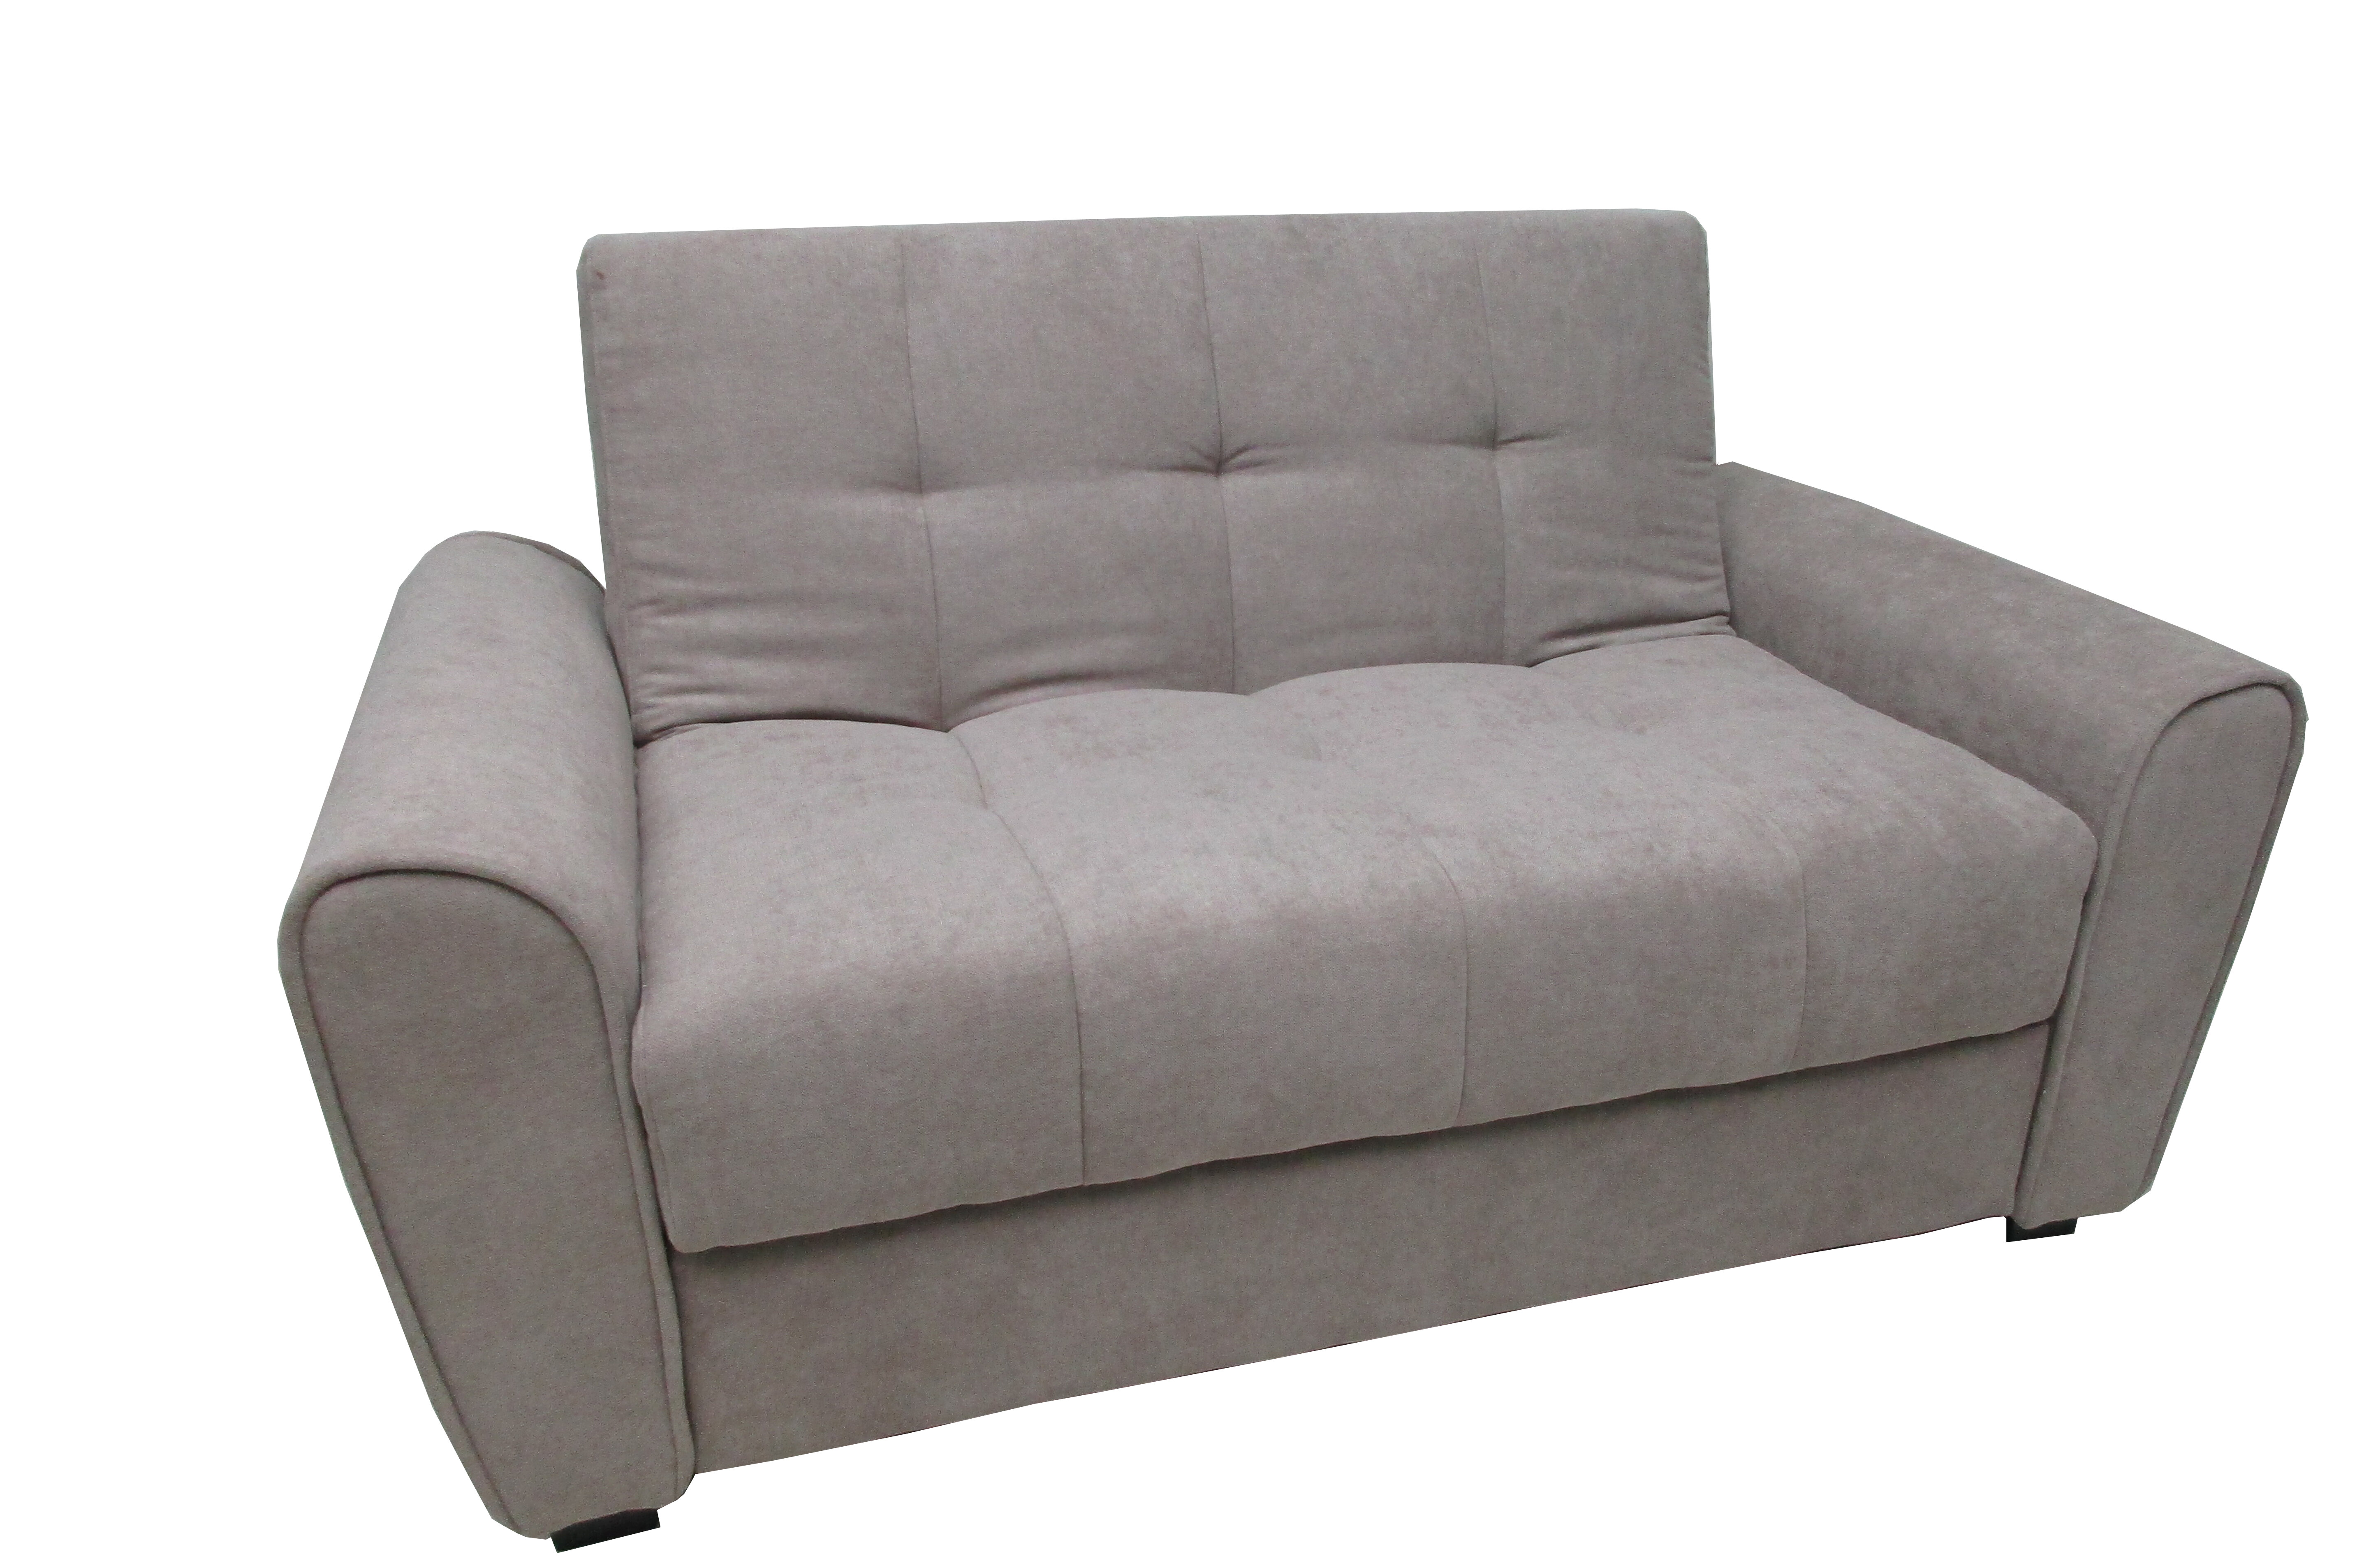 Stockman Sofa Bed Joss Main